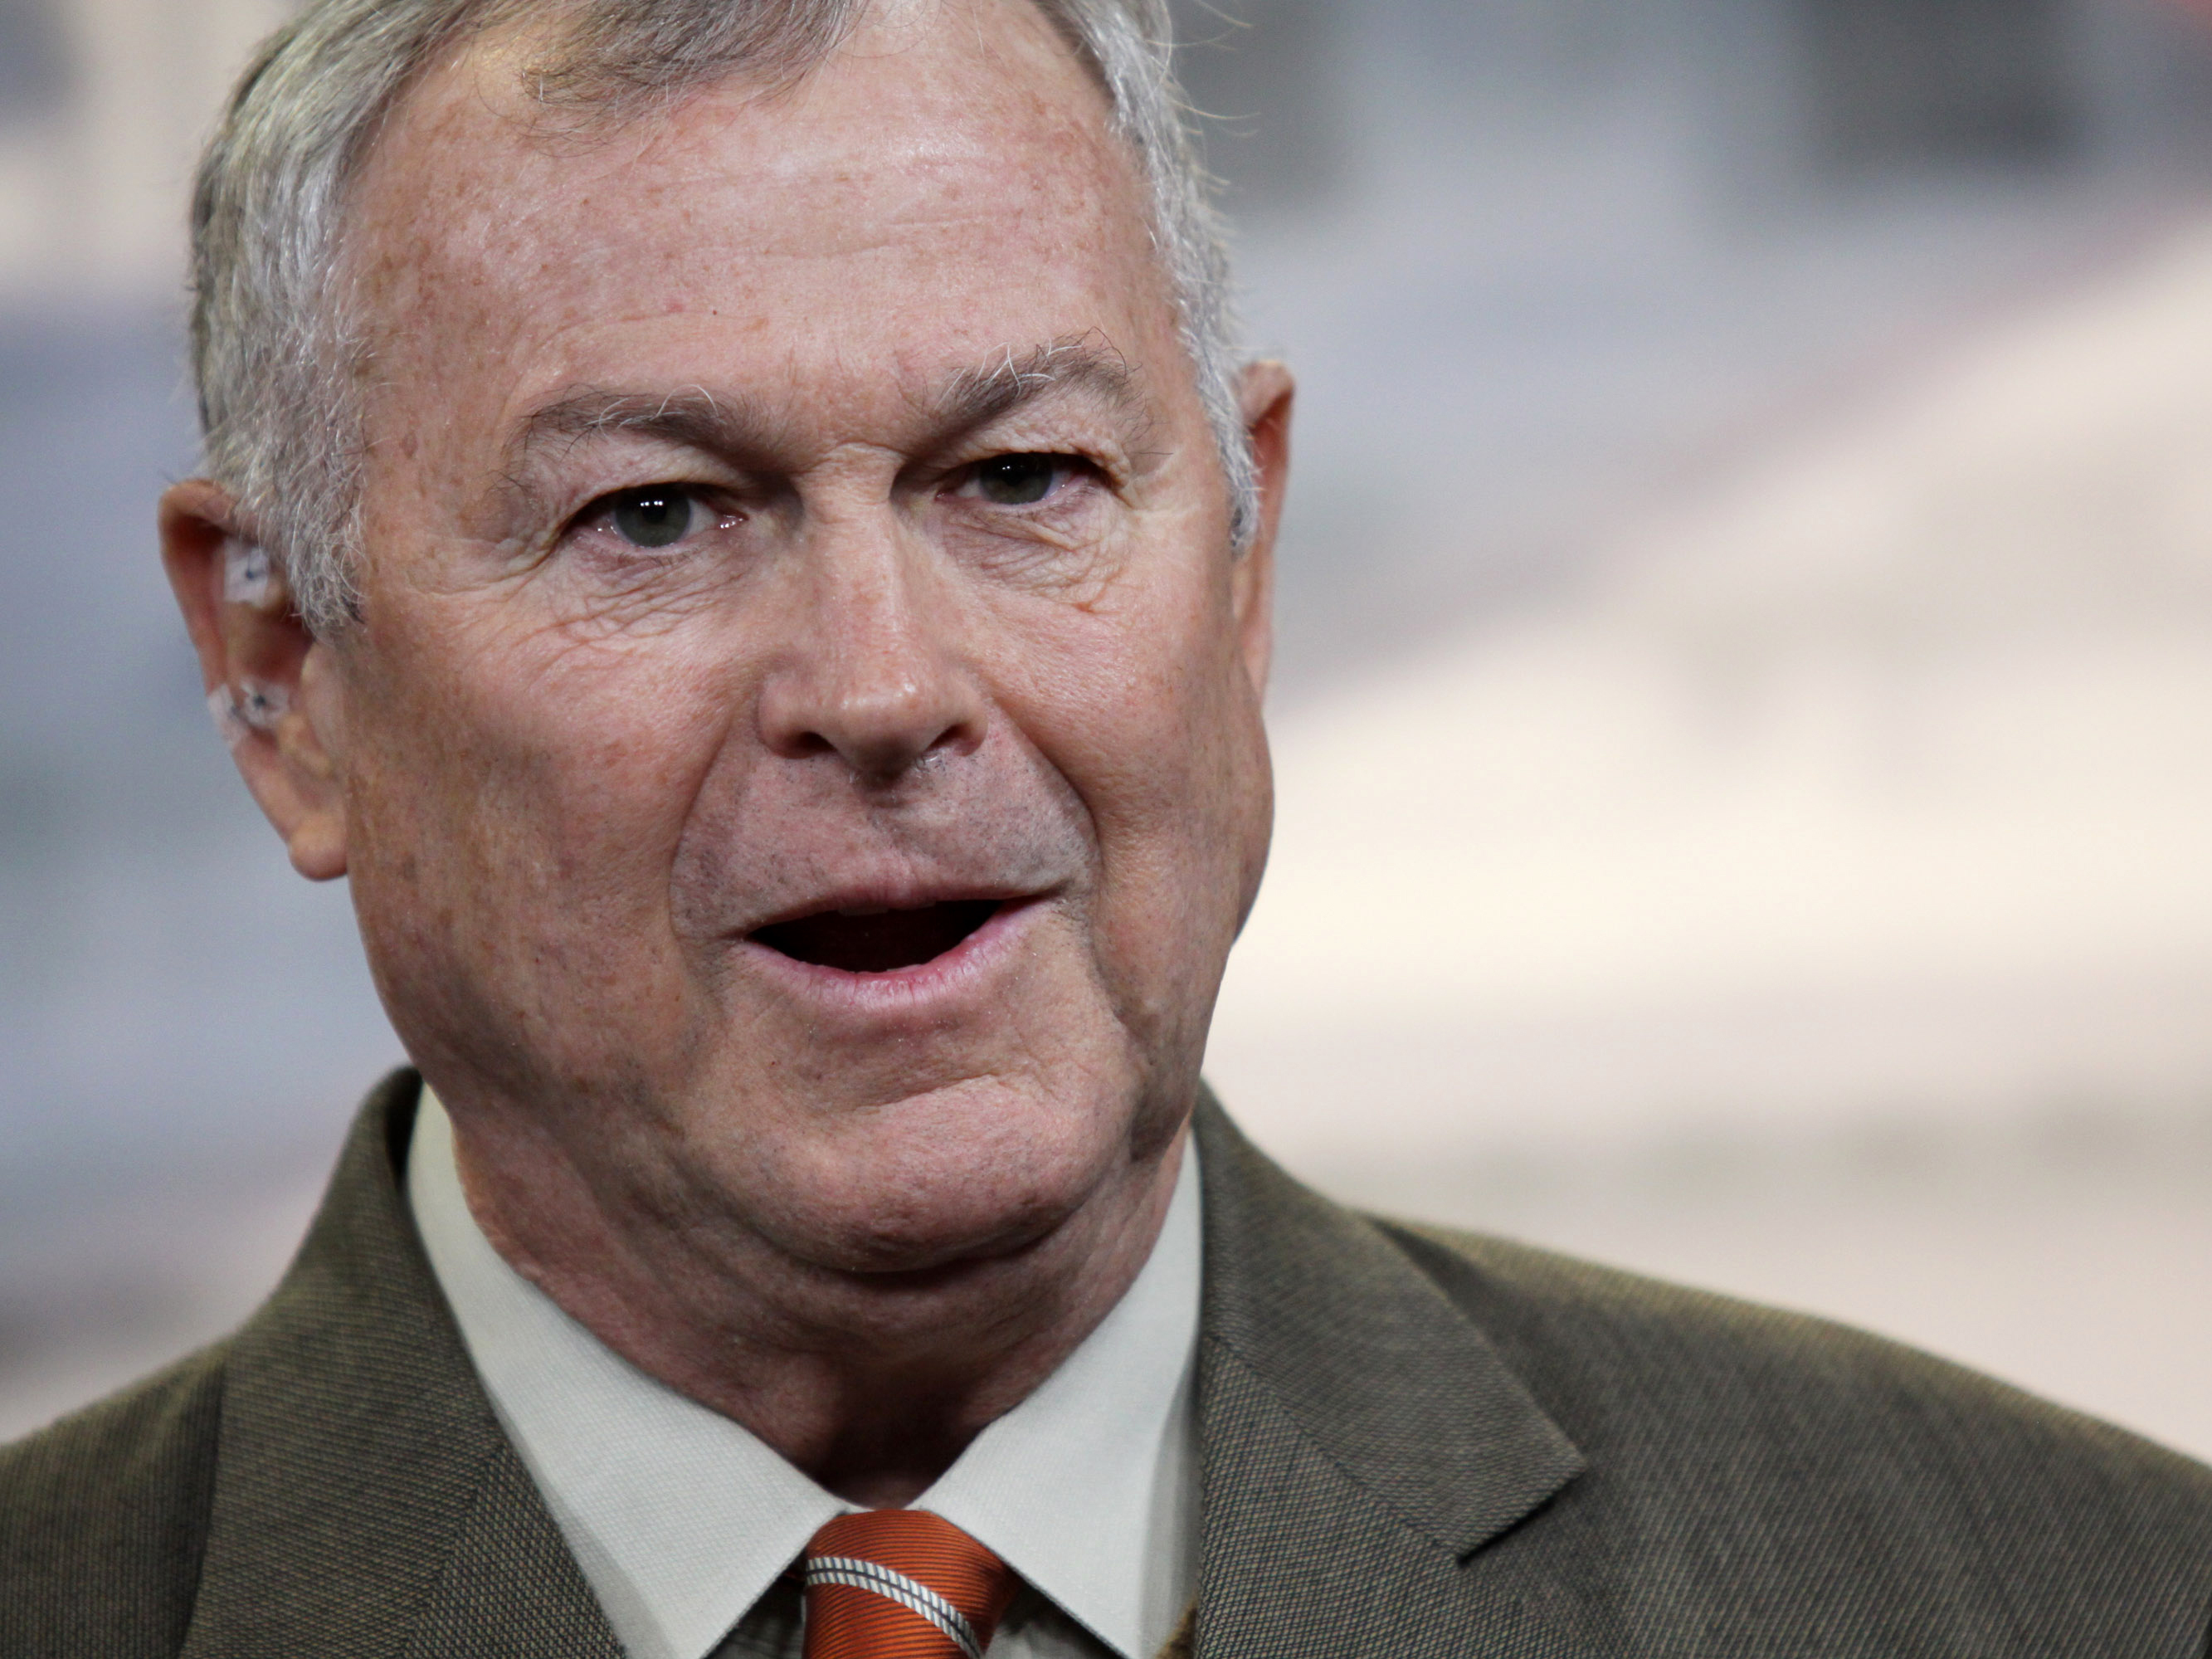 California Primary Rule May Hurt Democrats' Bid To Unseat GOP's Rohrabacher